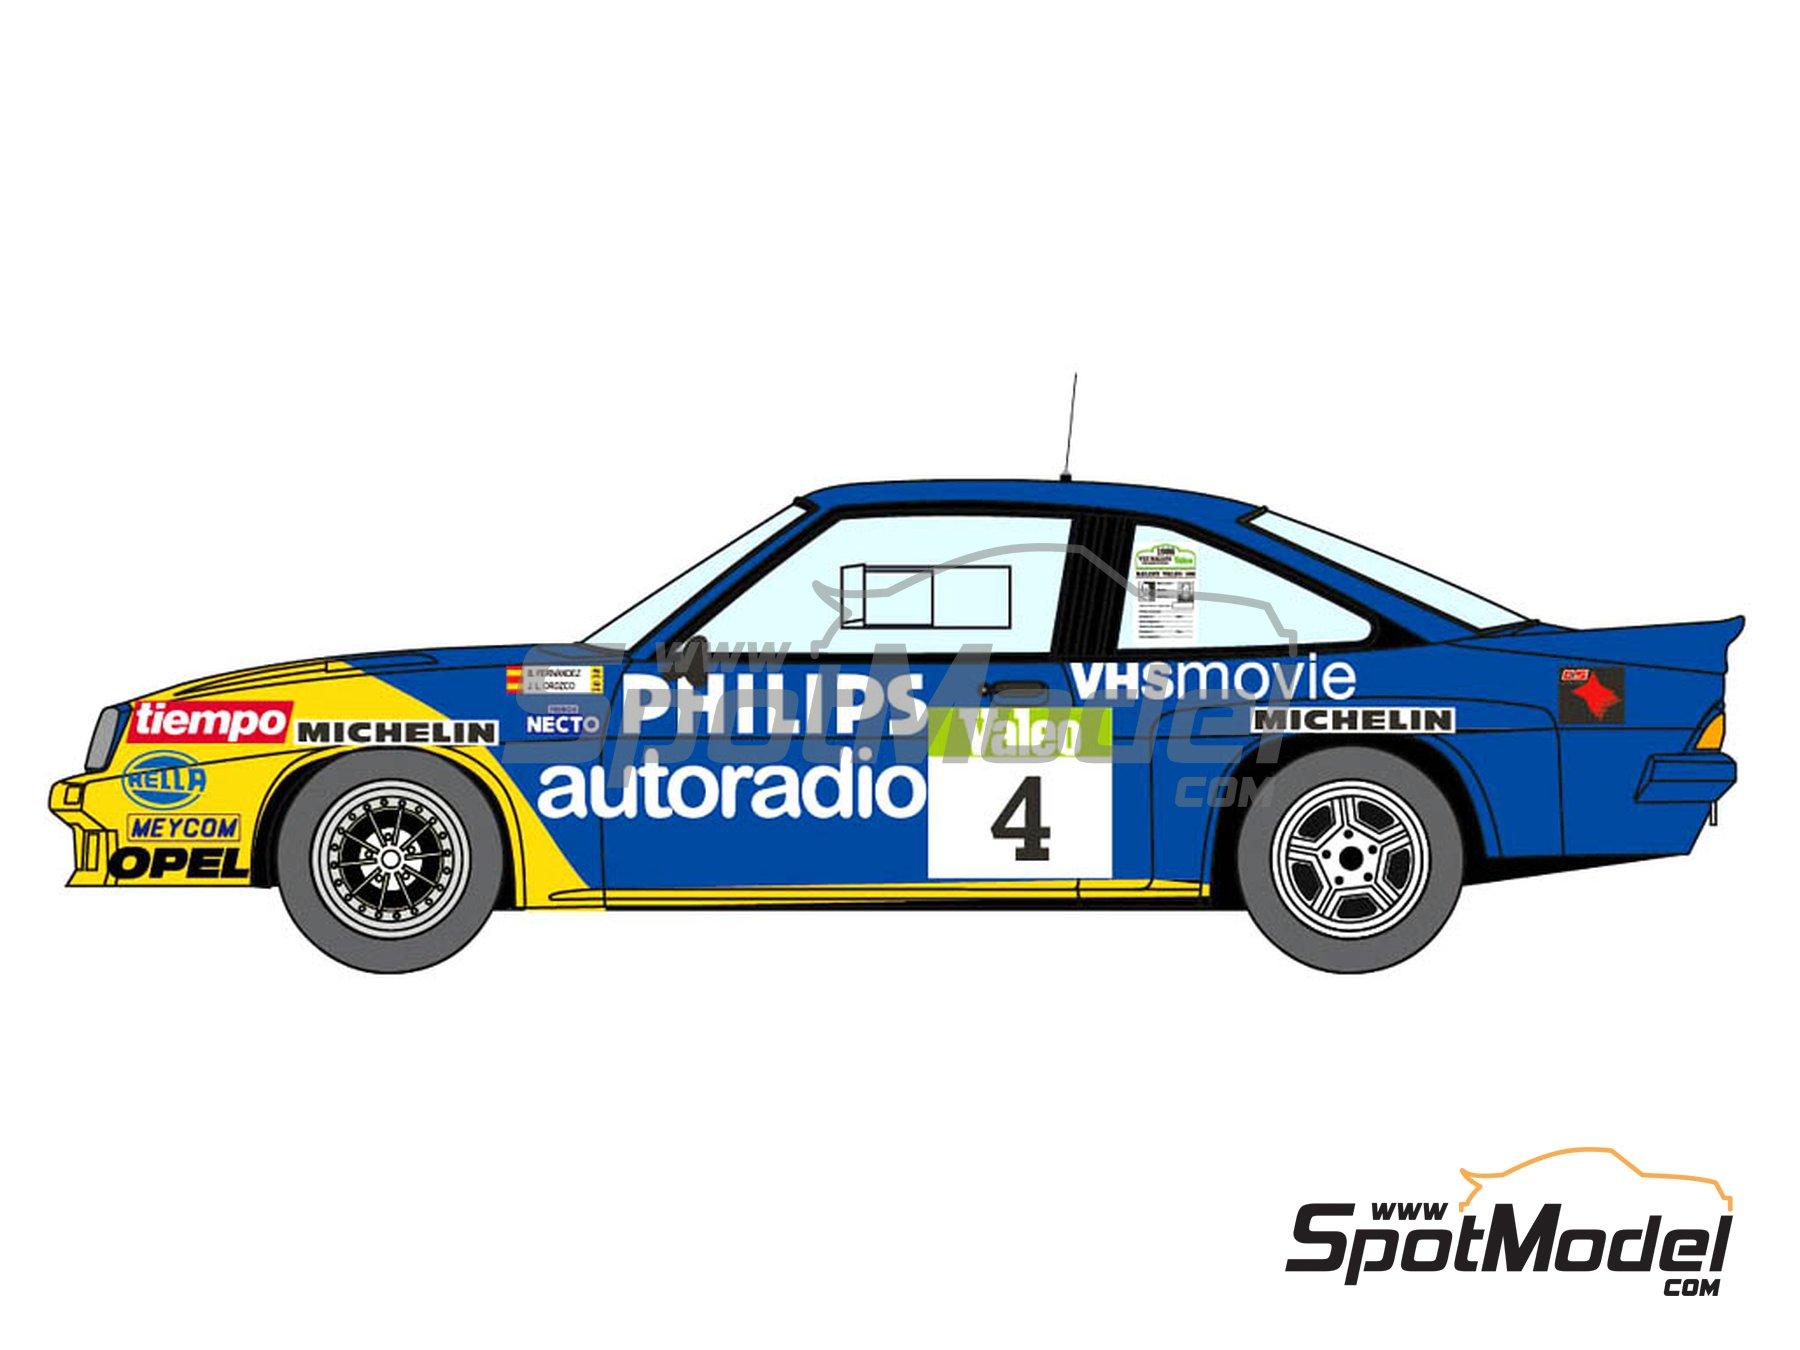 Image 1: Opel Manta 400 Group B Opel Team España - AvD/STH Hunsrück Rallye, Valeo Rally, Rallye Catalunya, Rally Albena - Zlatni Piassatzi - Sliven 1986 | Marking / livery in 1/24 scale manufactured by Decalcas (ref.DCL-DEC017)